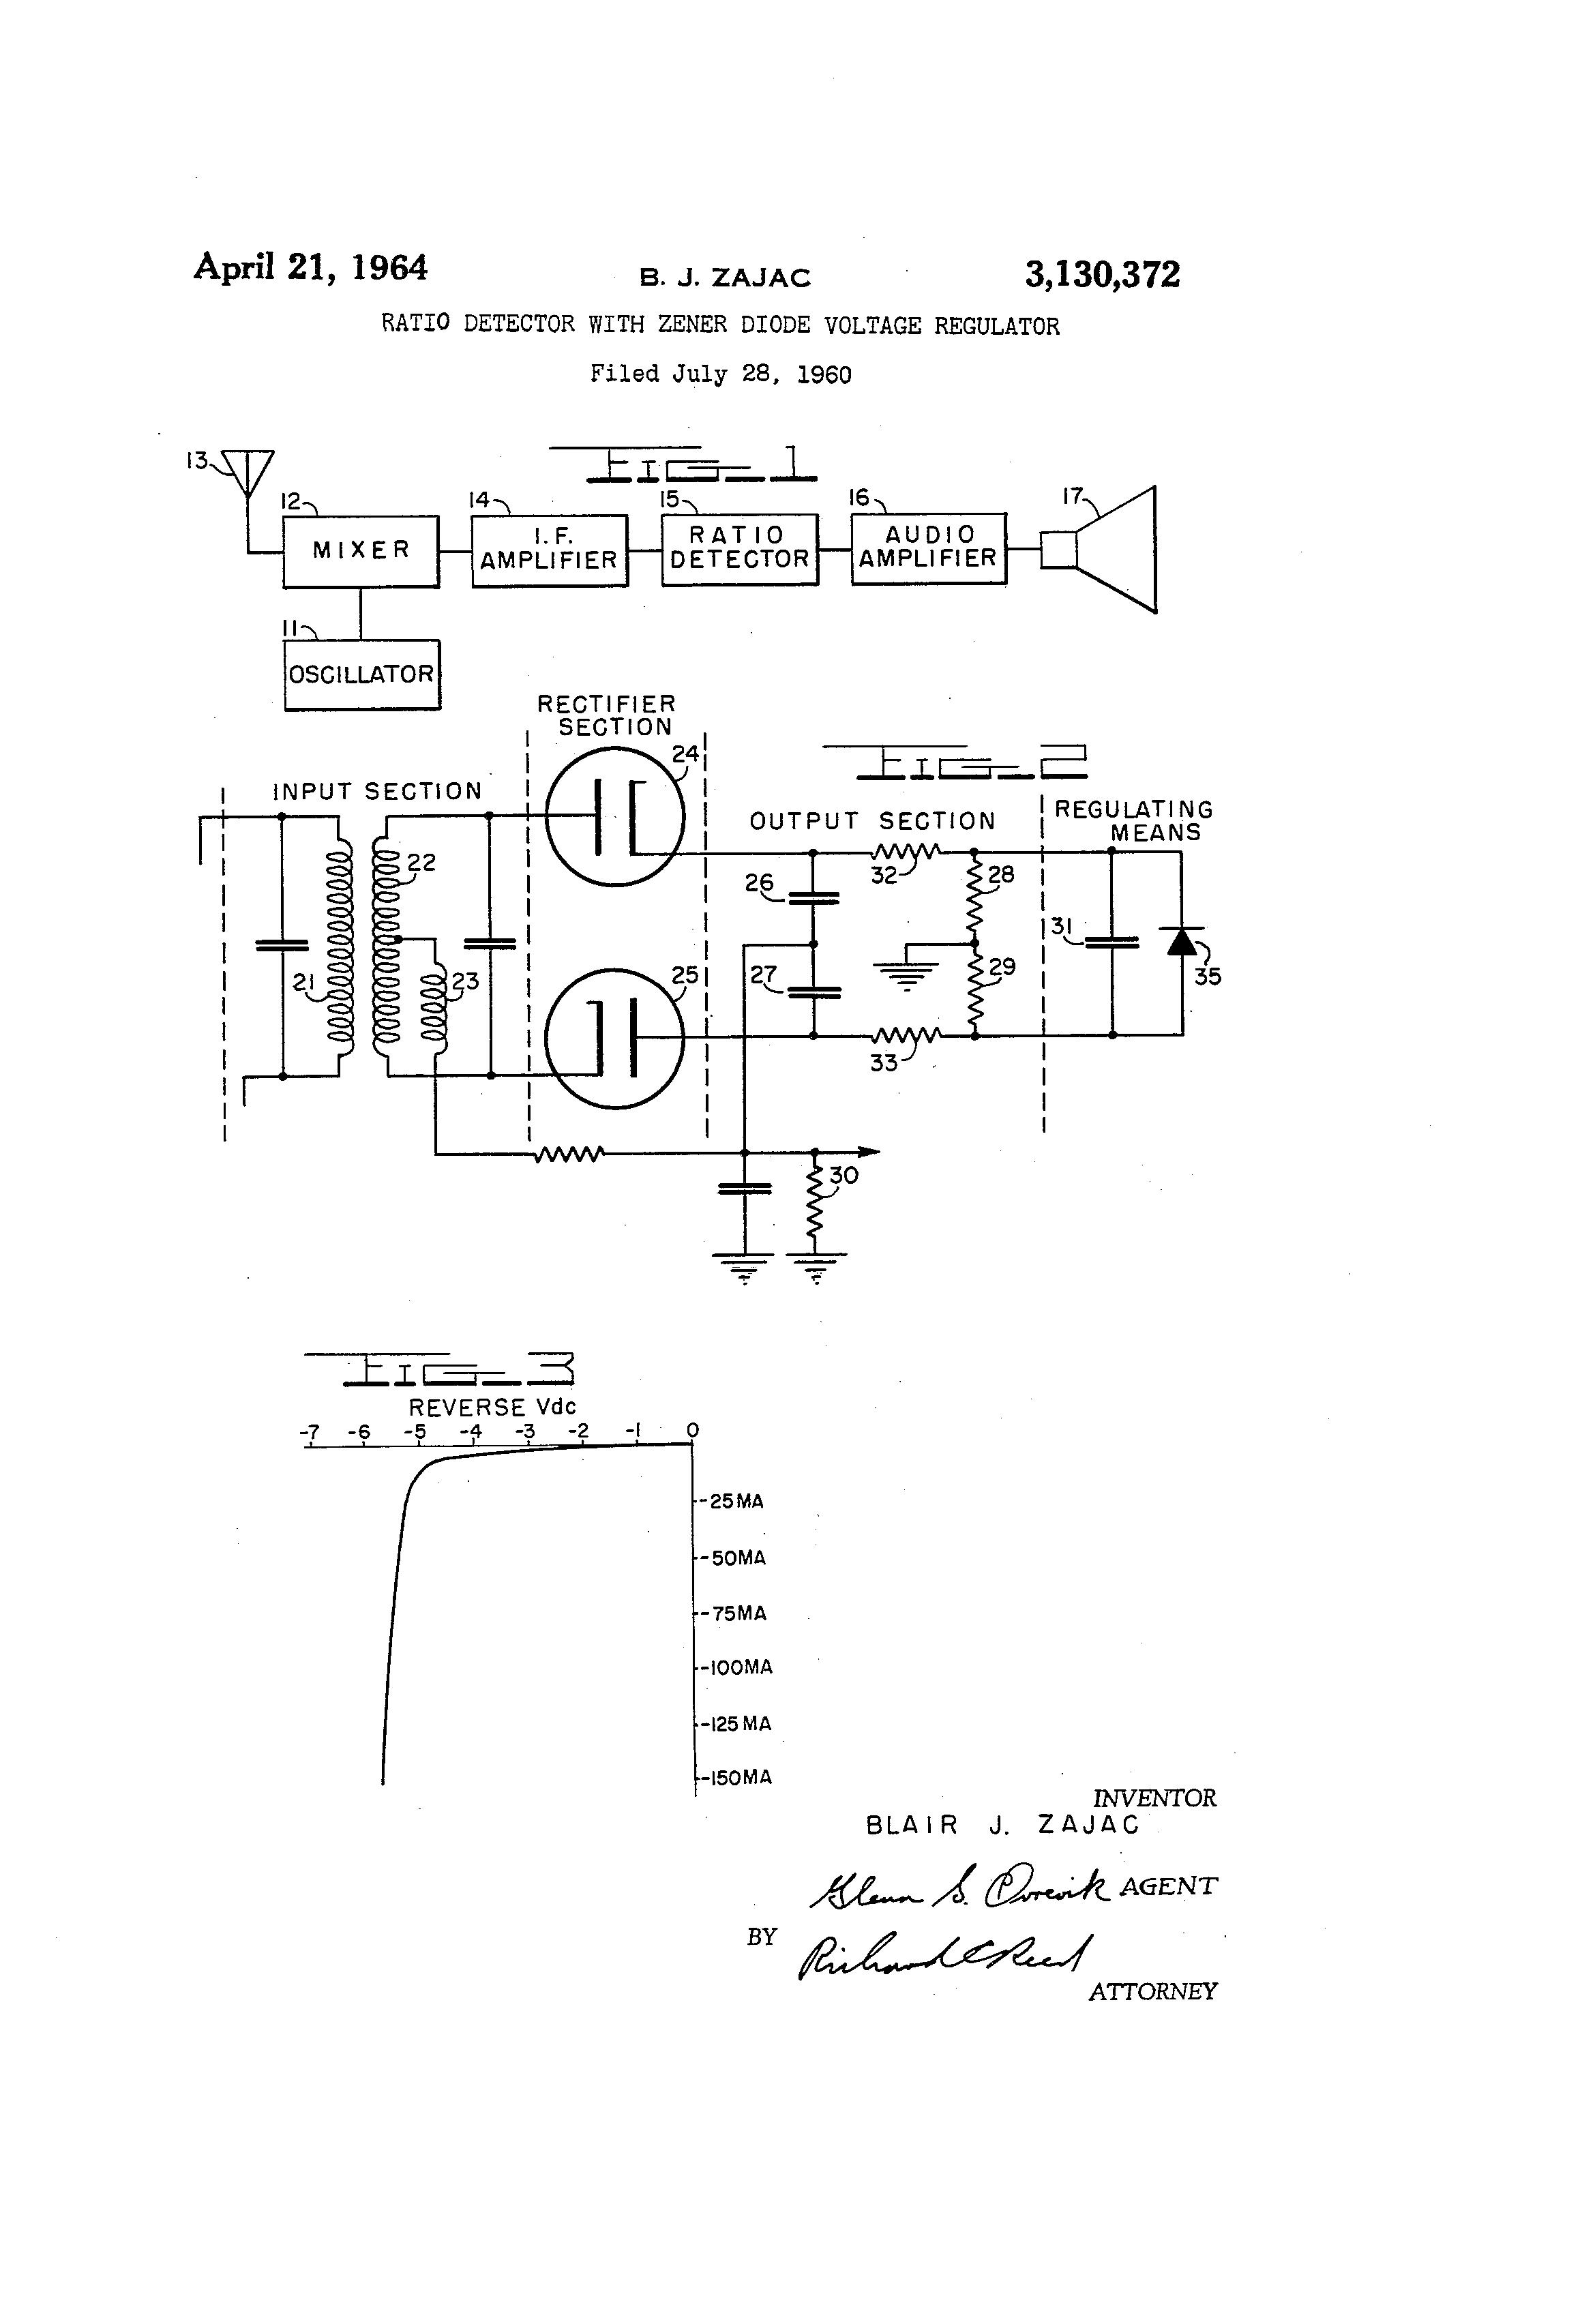 Brevet Us3130372 Ratio Detector With Zener Diode Voltage Regulator Circuit Diagram Patent Drawing